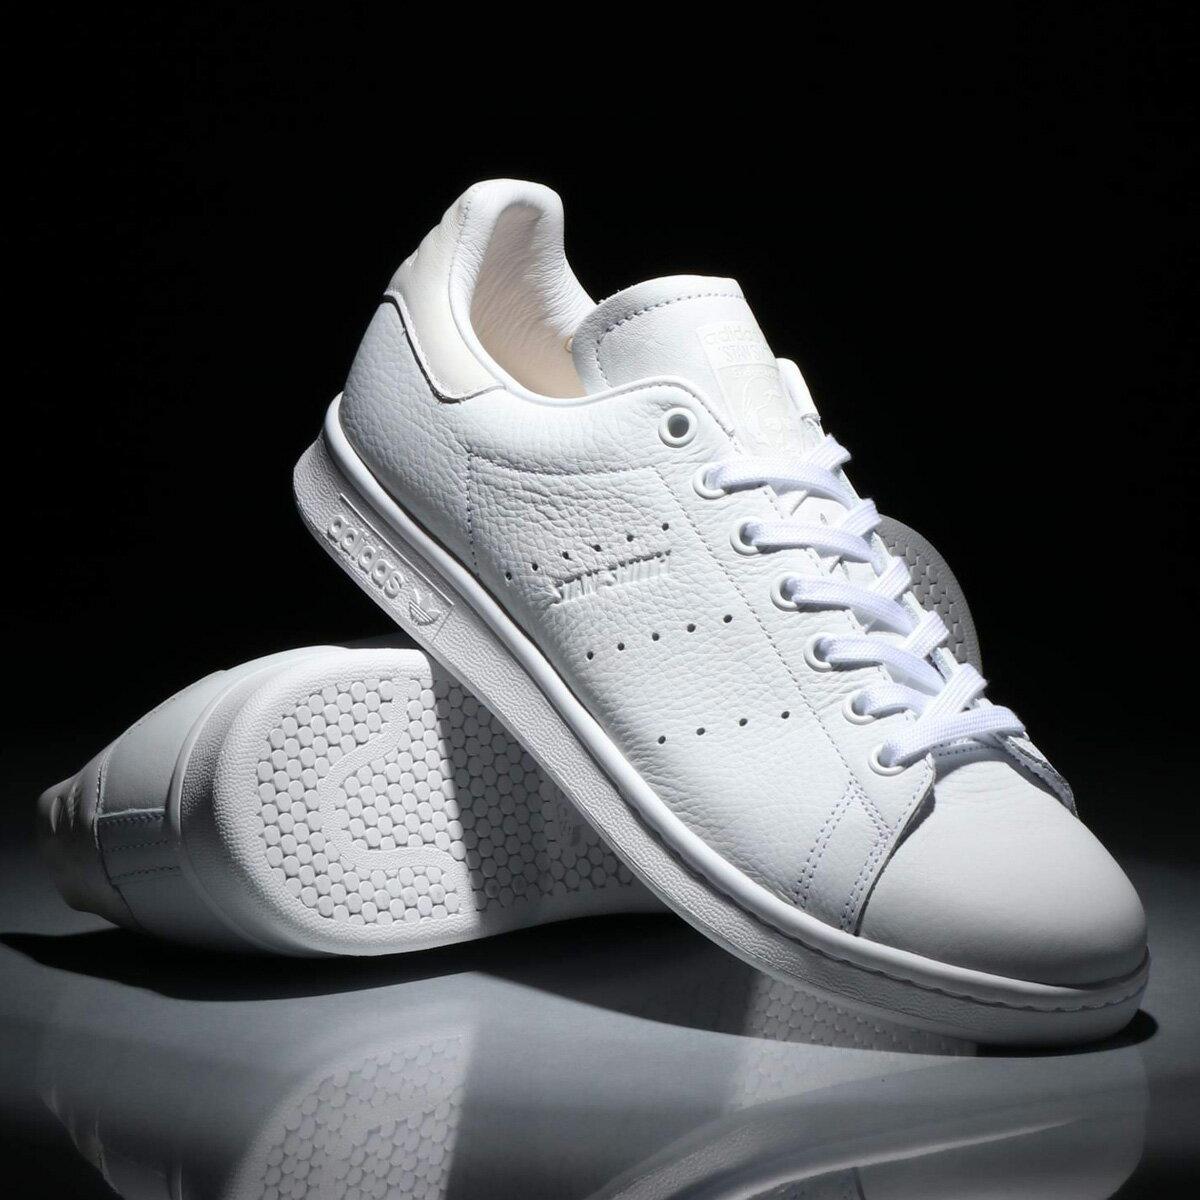 adidas Originals STAN SMITH(アディダス オリジナルス スタンスミス)Running White/Running White/Running White【メンズ レディース スニーカー】18SS-I